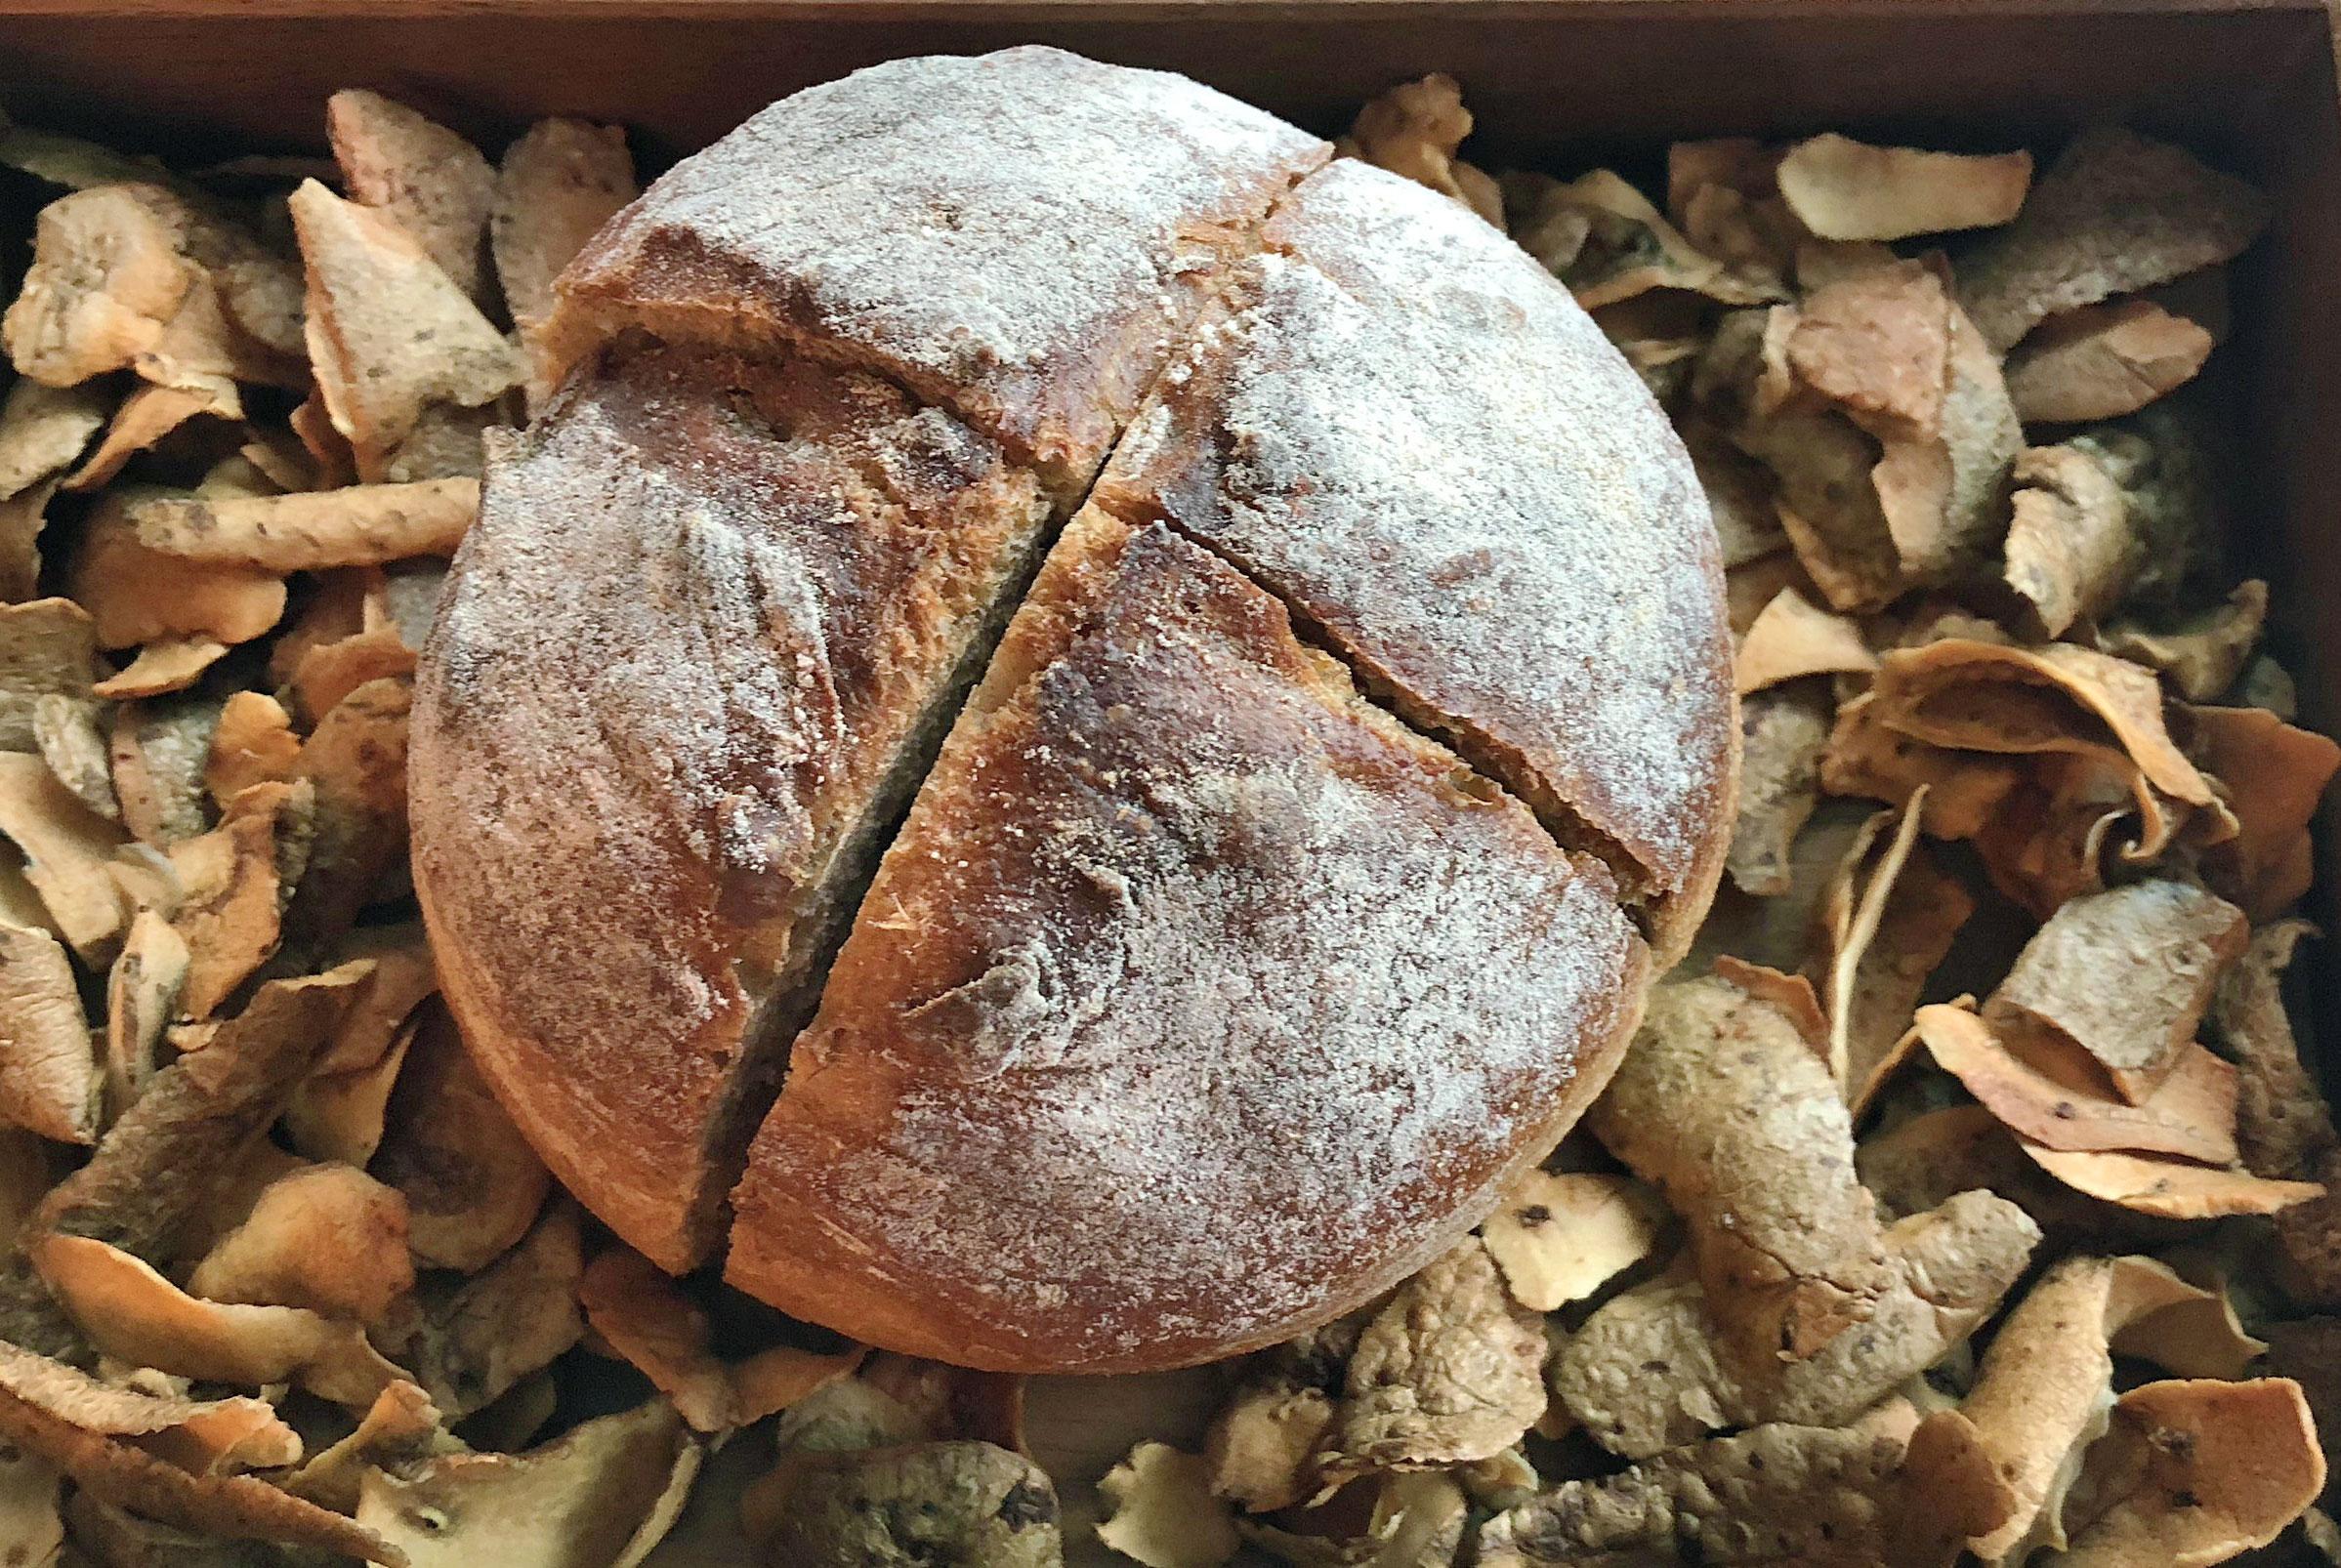 potato-bread-7132-silver-vals.jpg